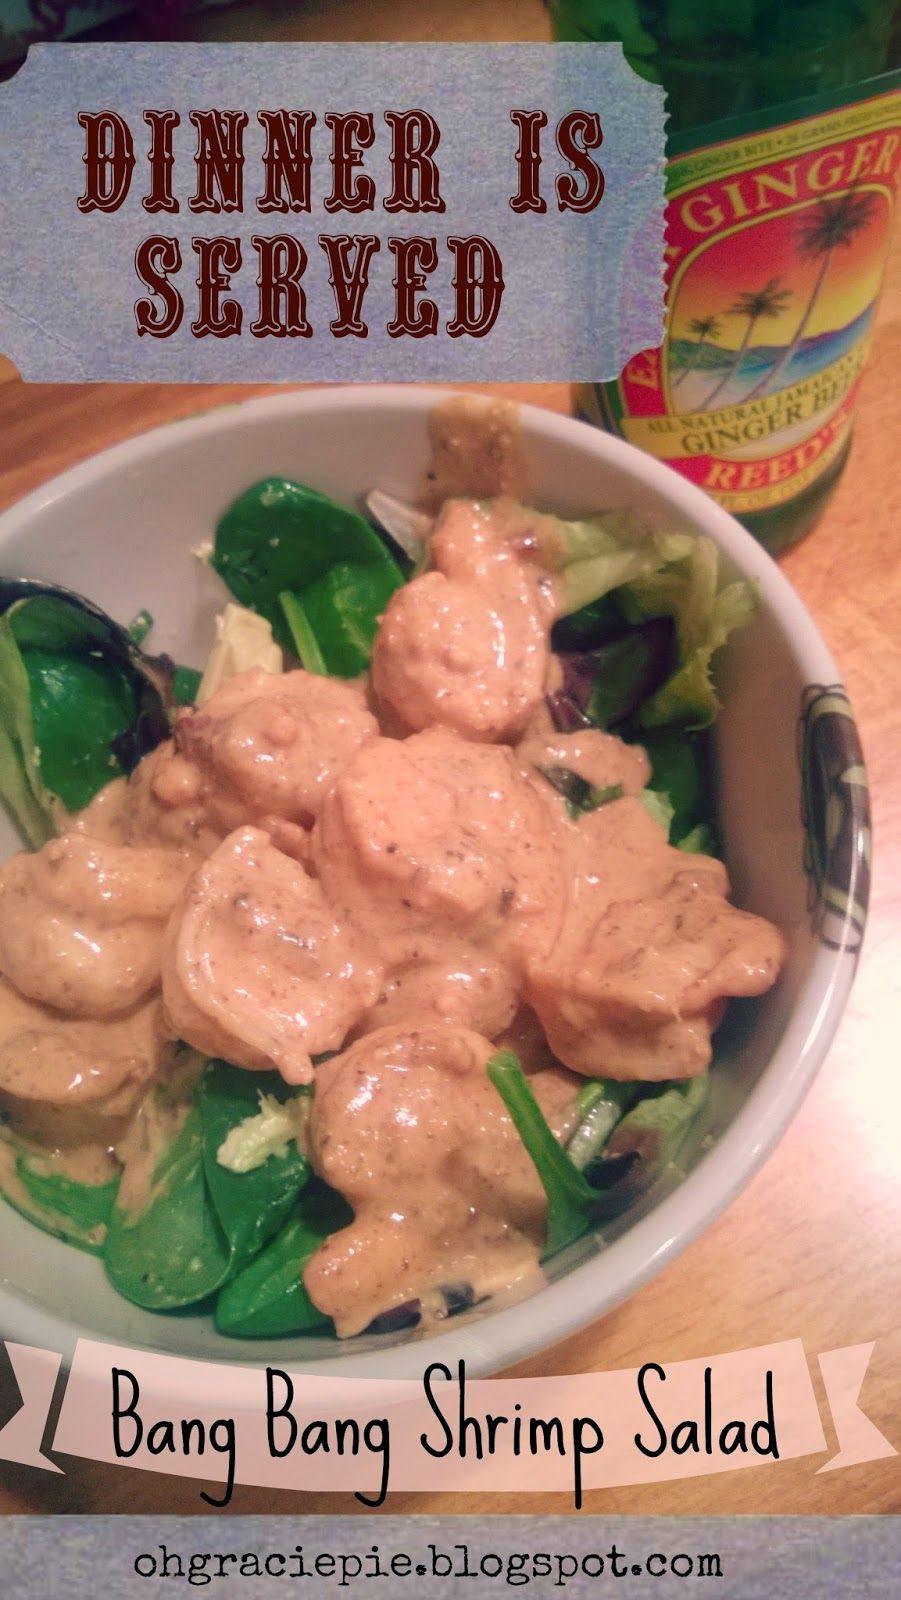 Bang Bang Shrimp Salad! Paleo happy &  P3 HCG Friendly /// Yum!  ohgraciepie